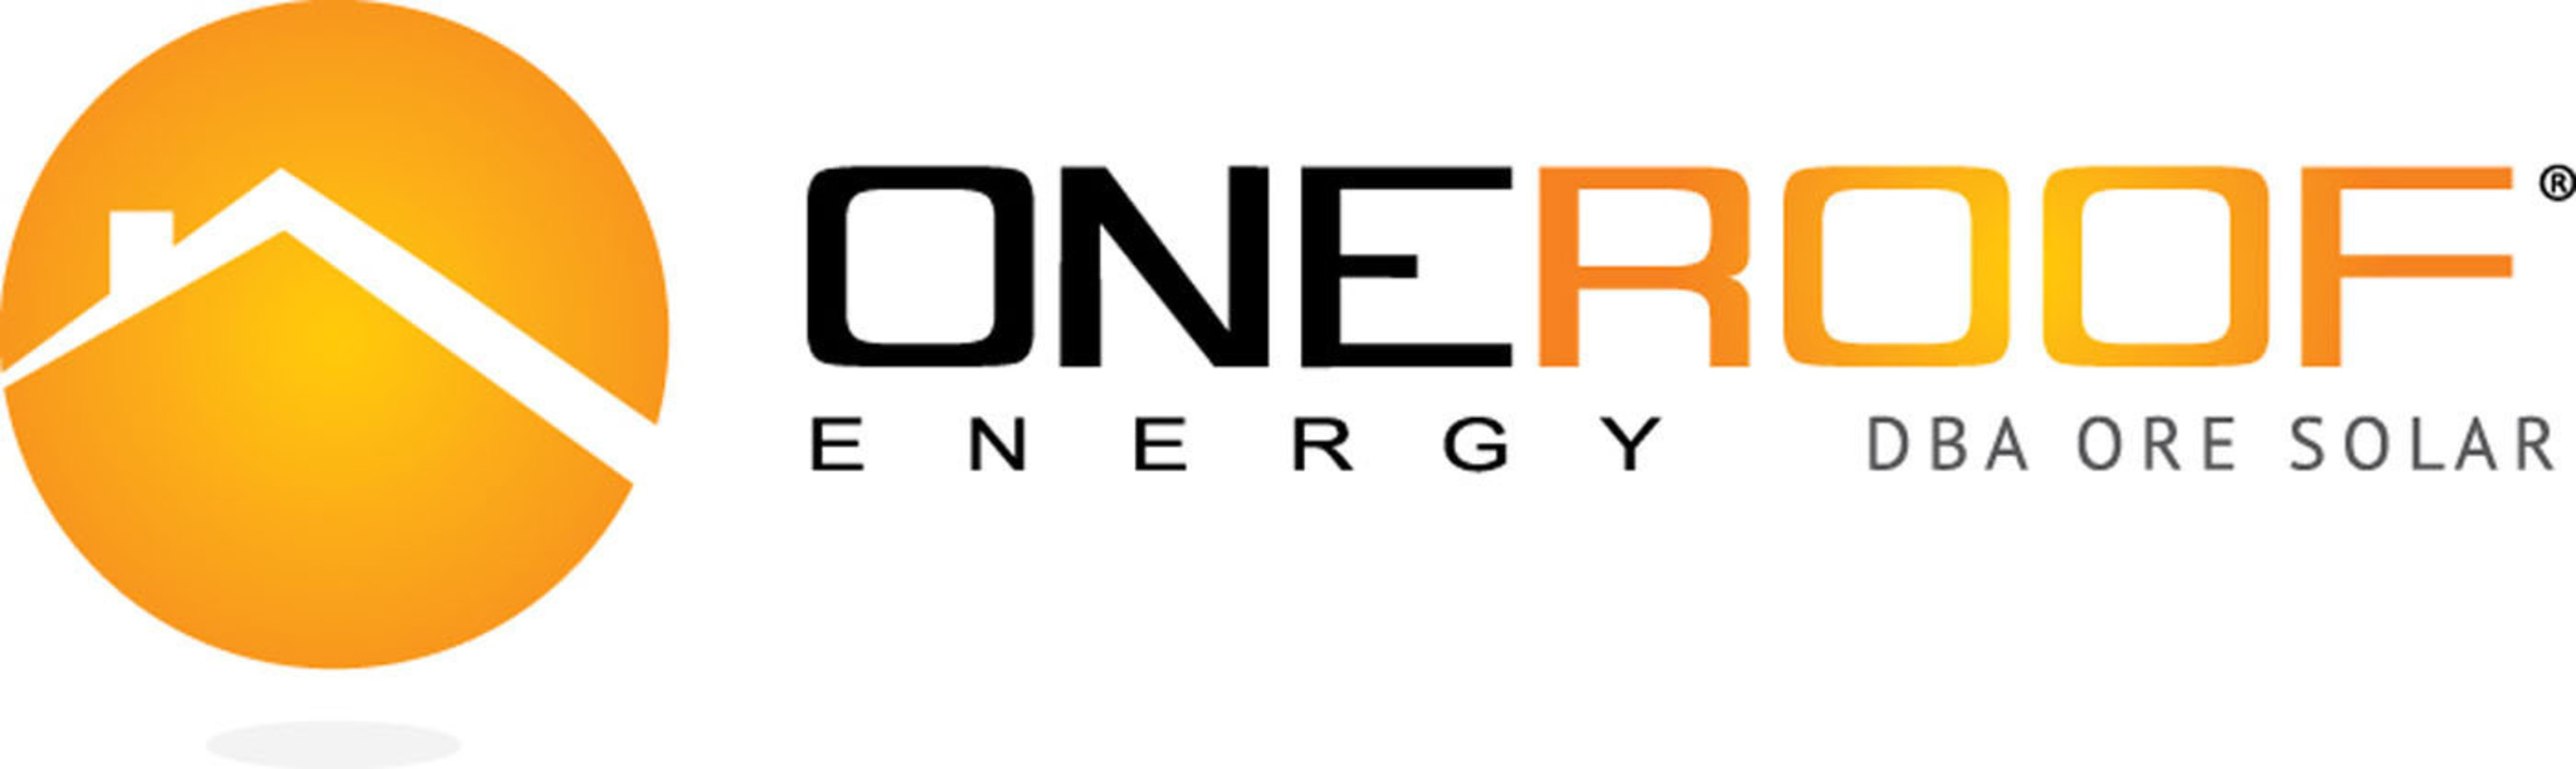 OneRoof Energy, Inc. Logo.